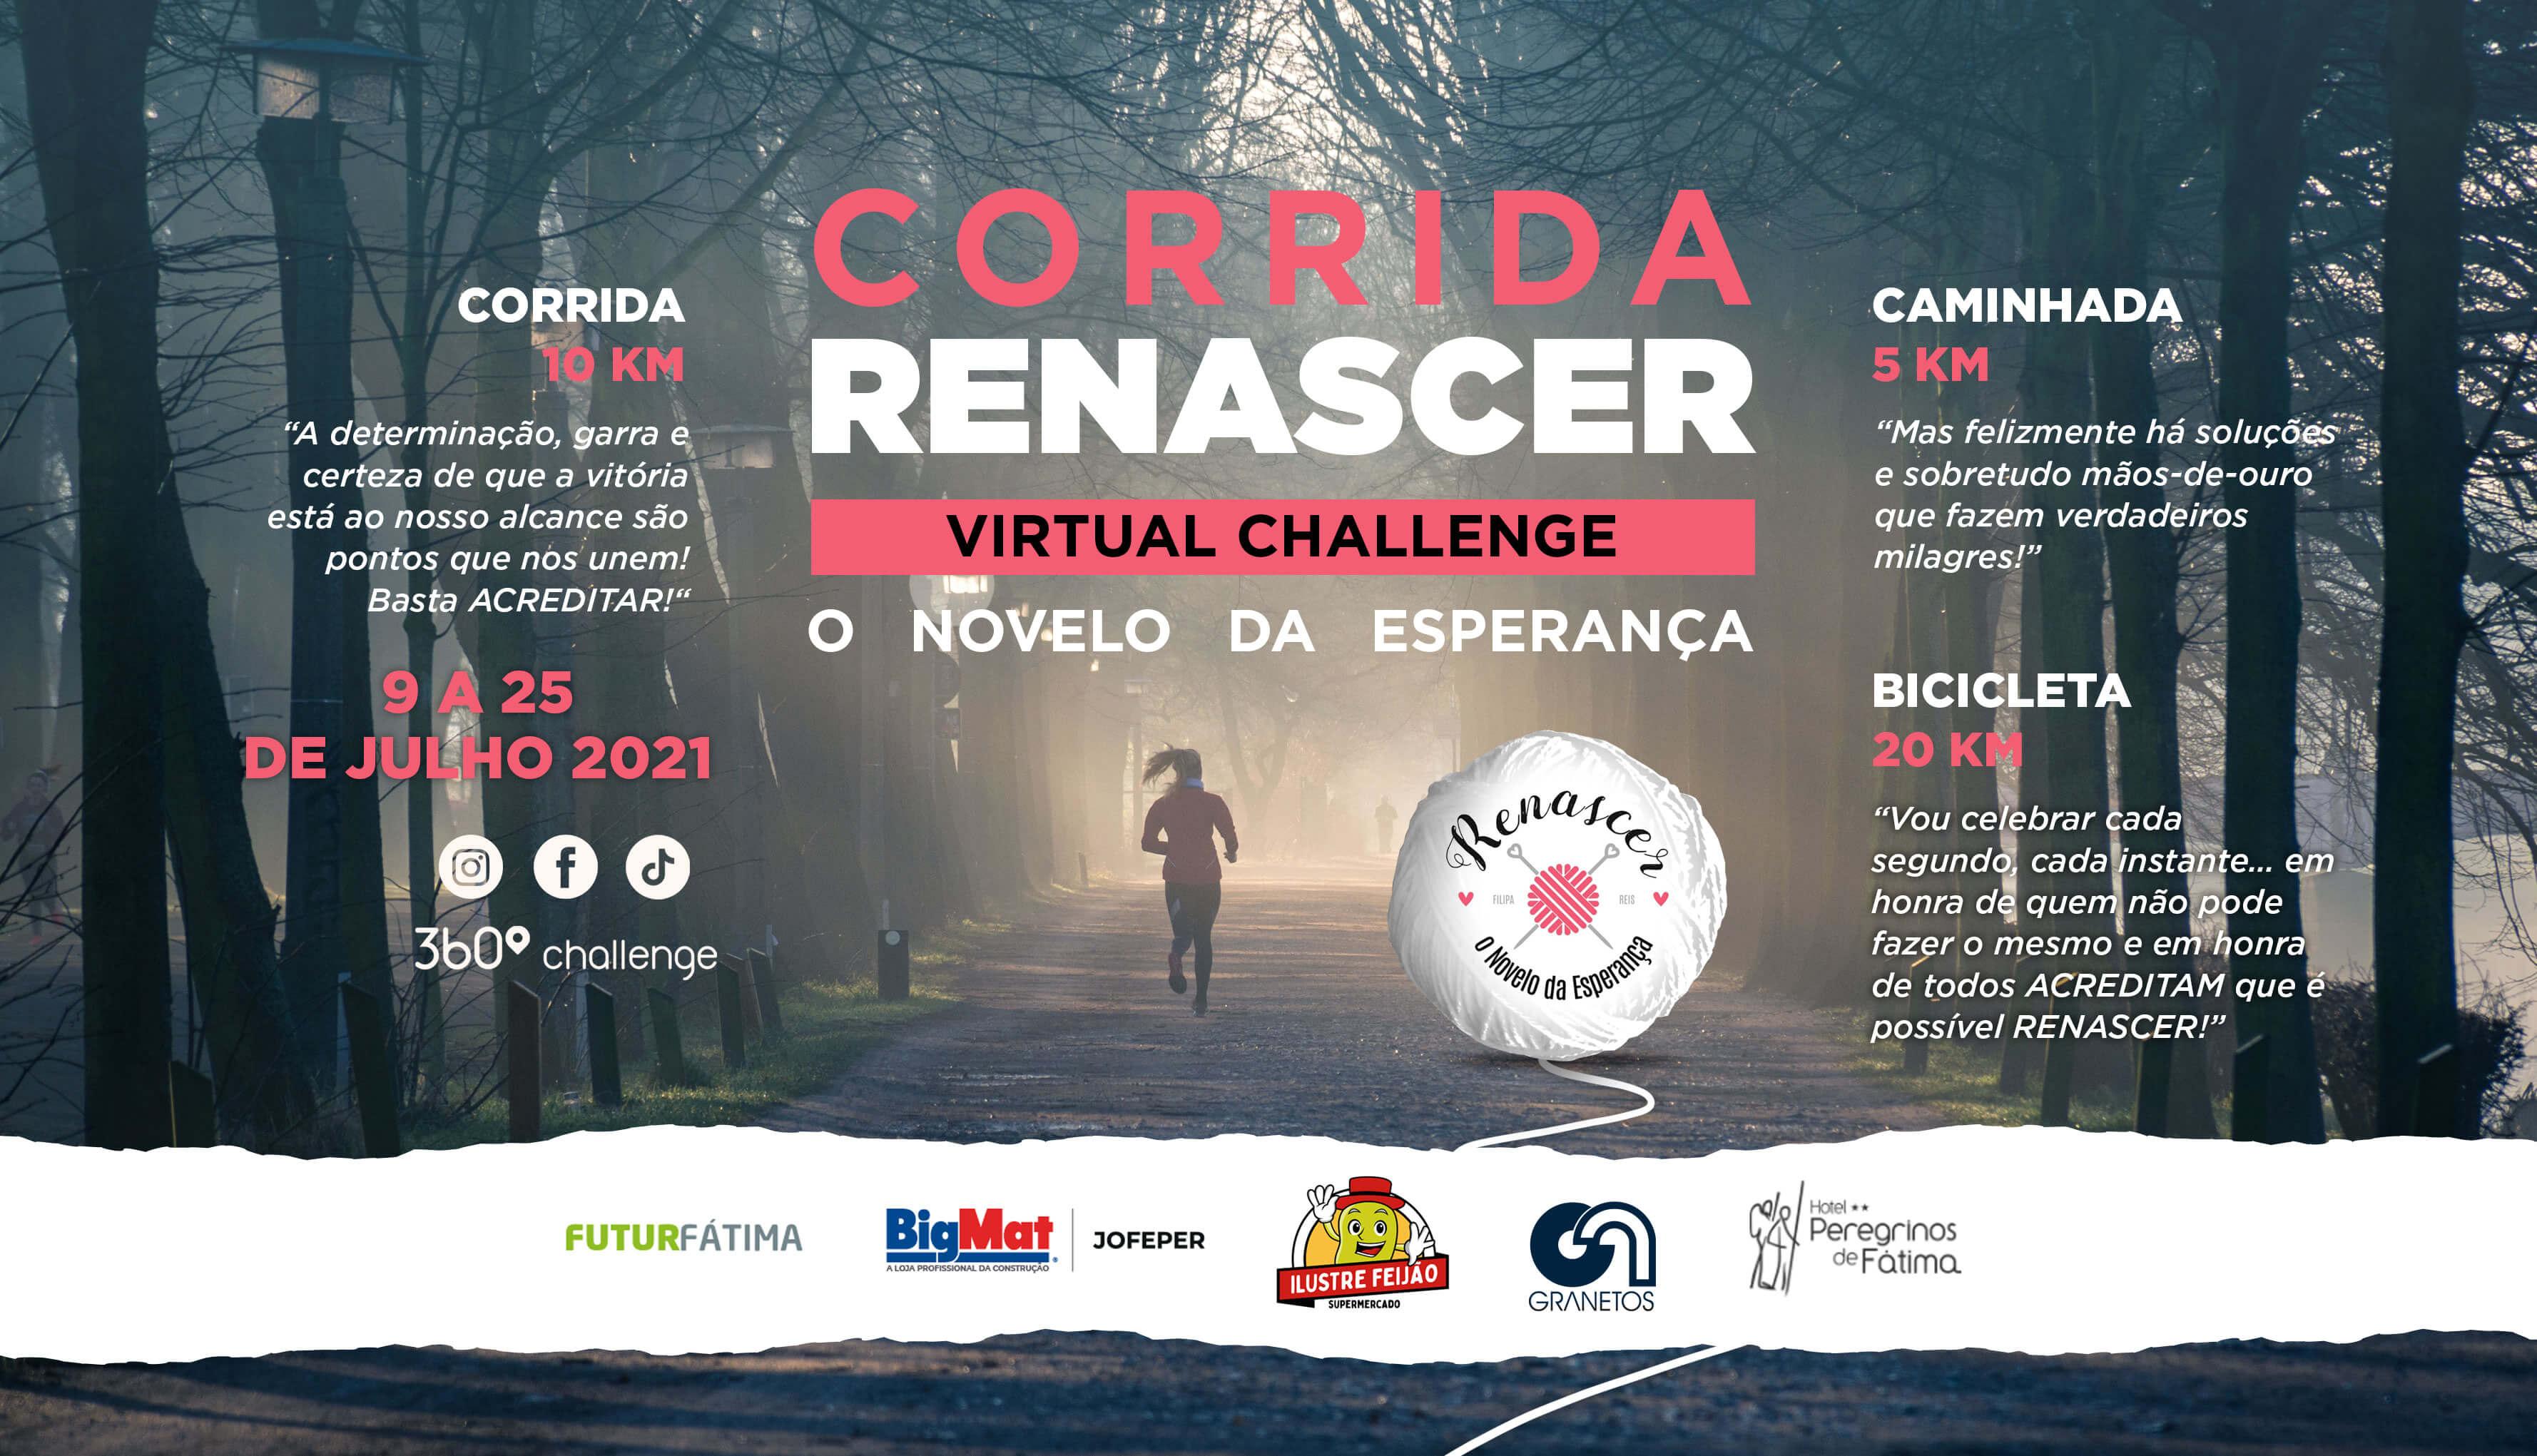 Corrida Renascer - Virtual Challenge